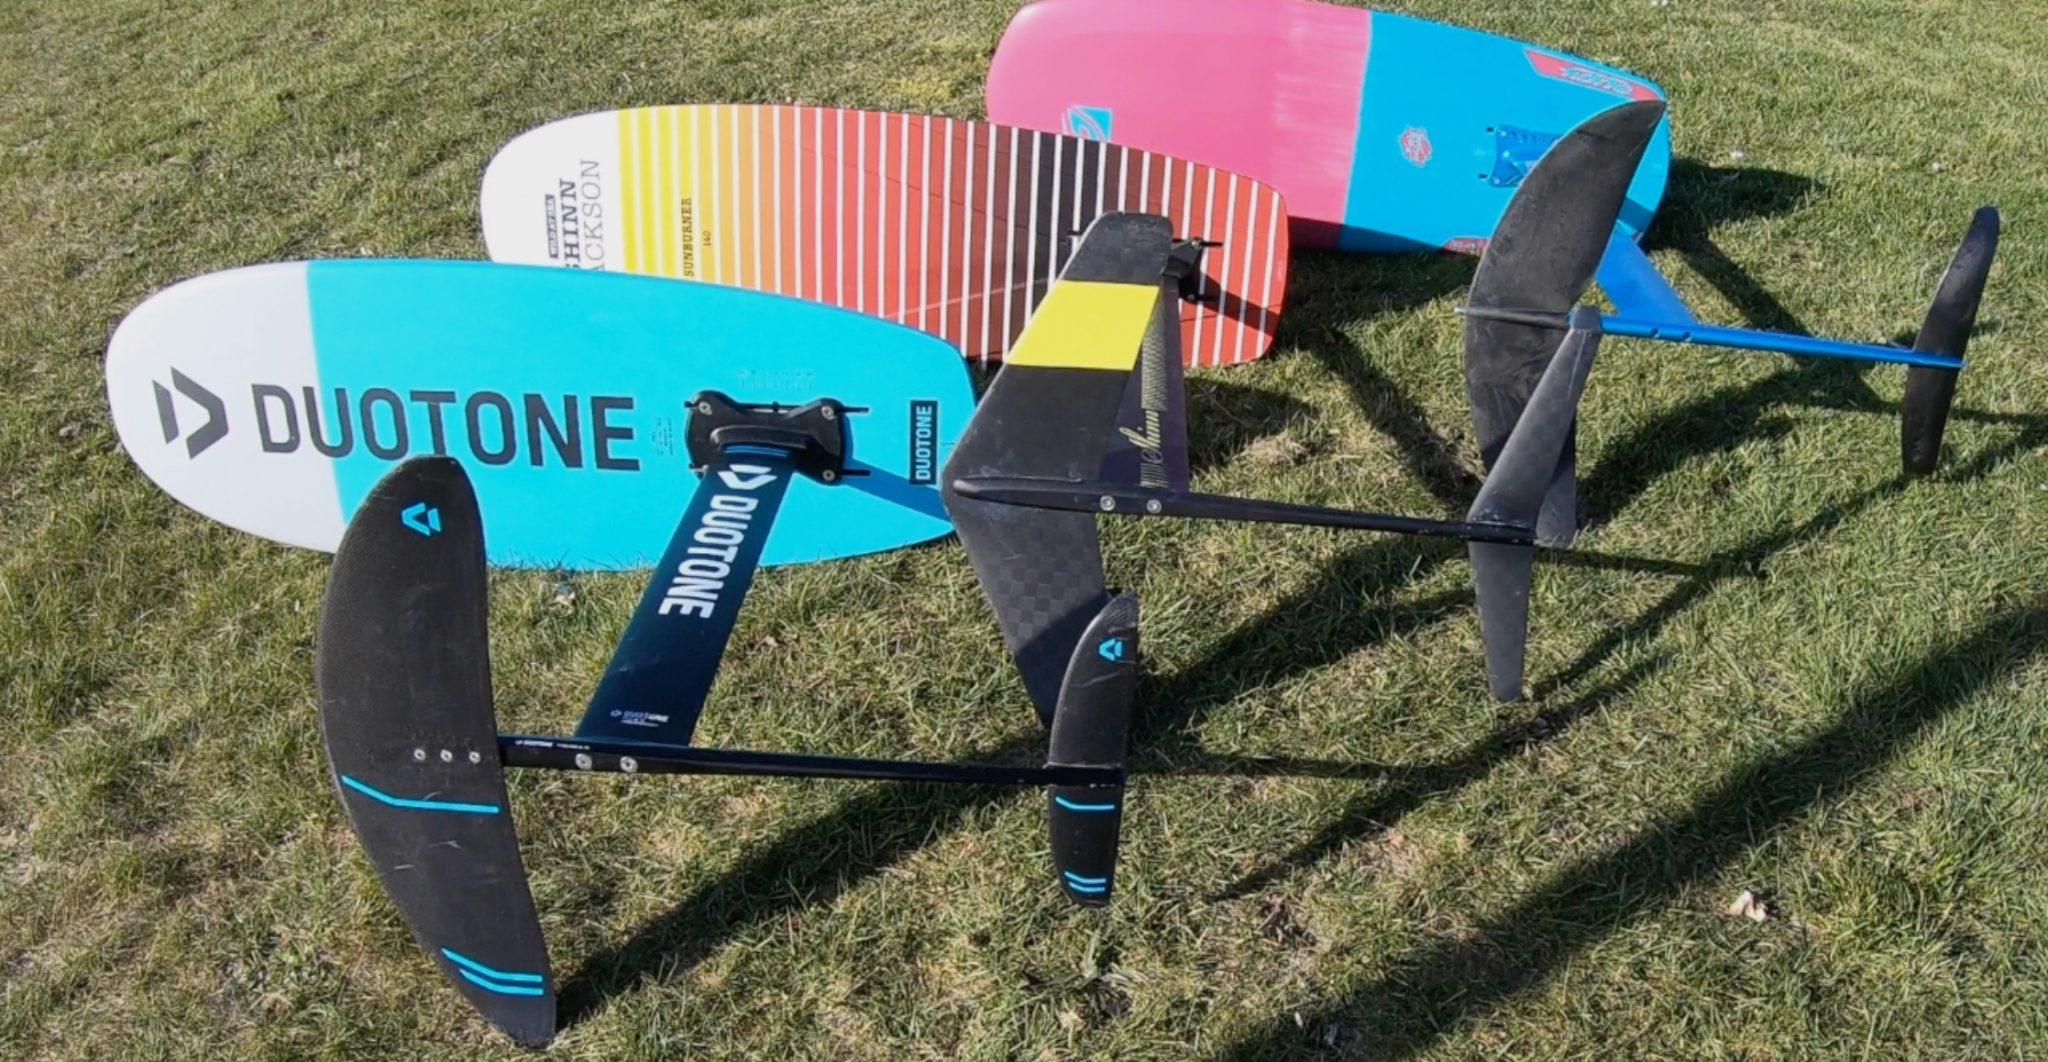 2020 hydrofoil test